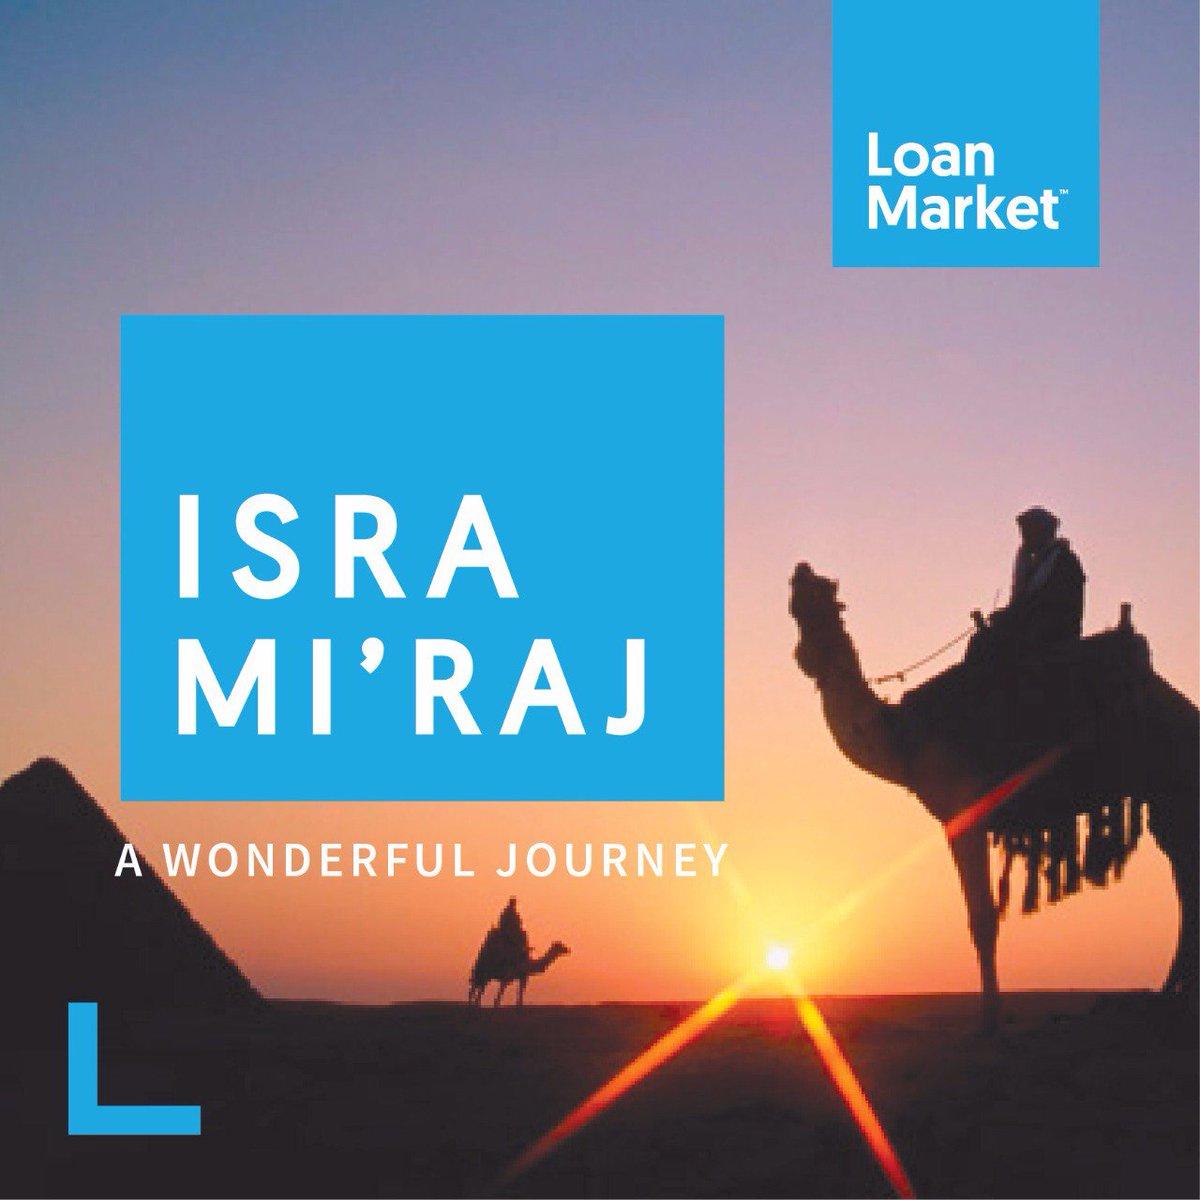 Selamat merayakan Isra Mi'raj 1439 H. A wonderful journey, . . . #loanmarket #loan #loanadviser #loanmarketindonesia #kredit #KPR #isramiraj #quotes #blue #instagram #goodday #wonderful #journey #selamat #happypic.twitter.com/LF7BFn7qNC